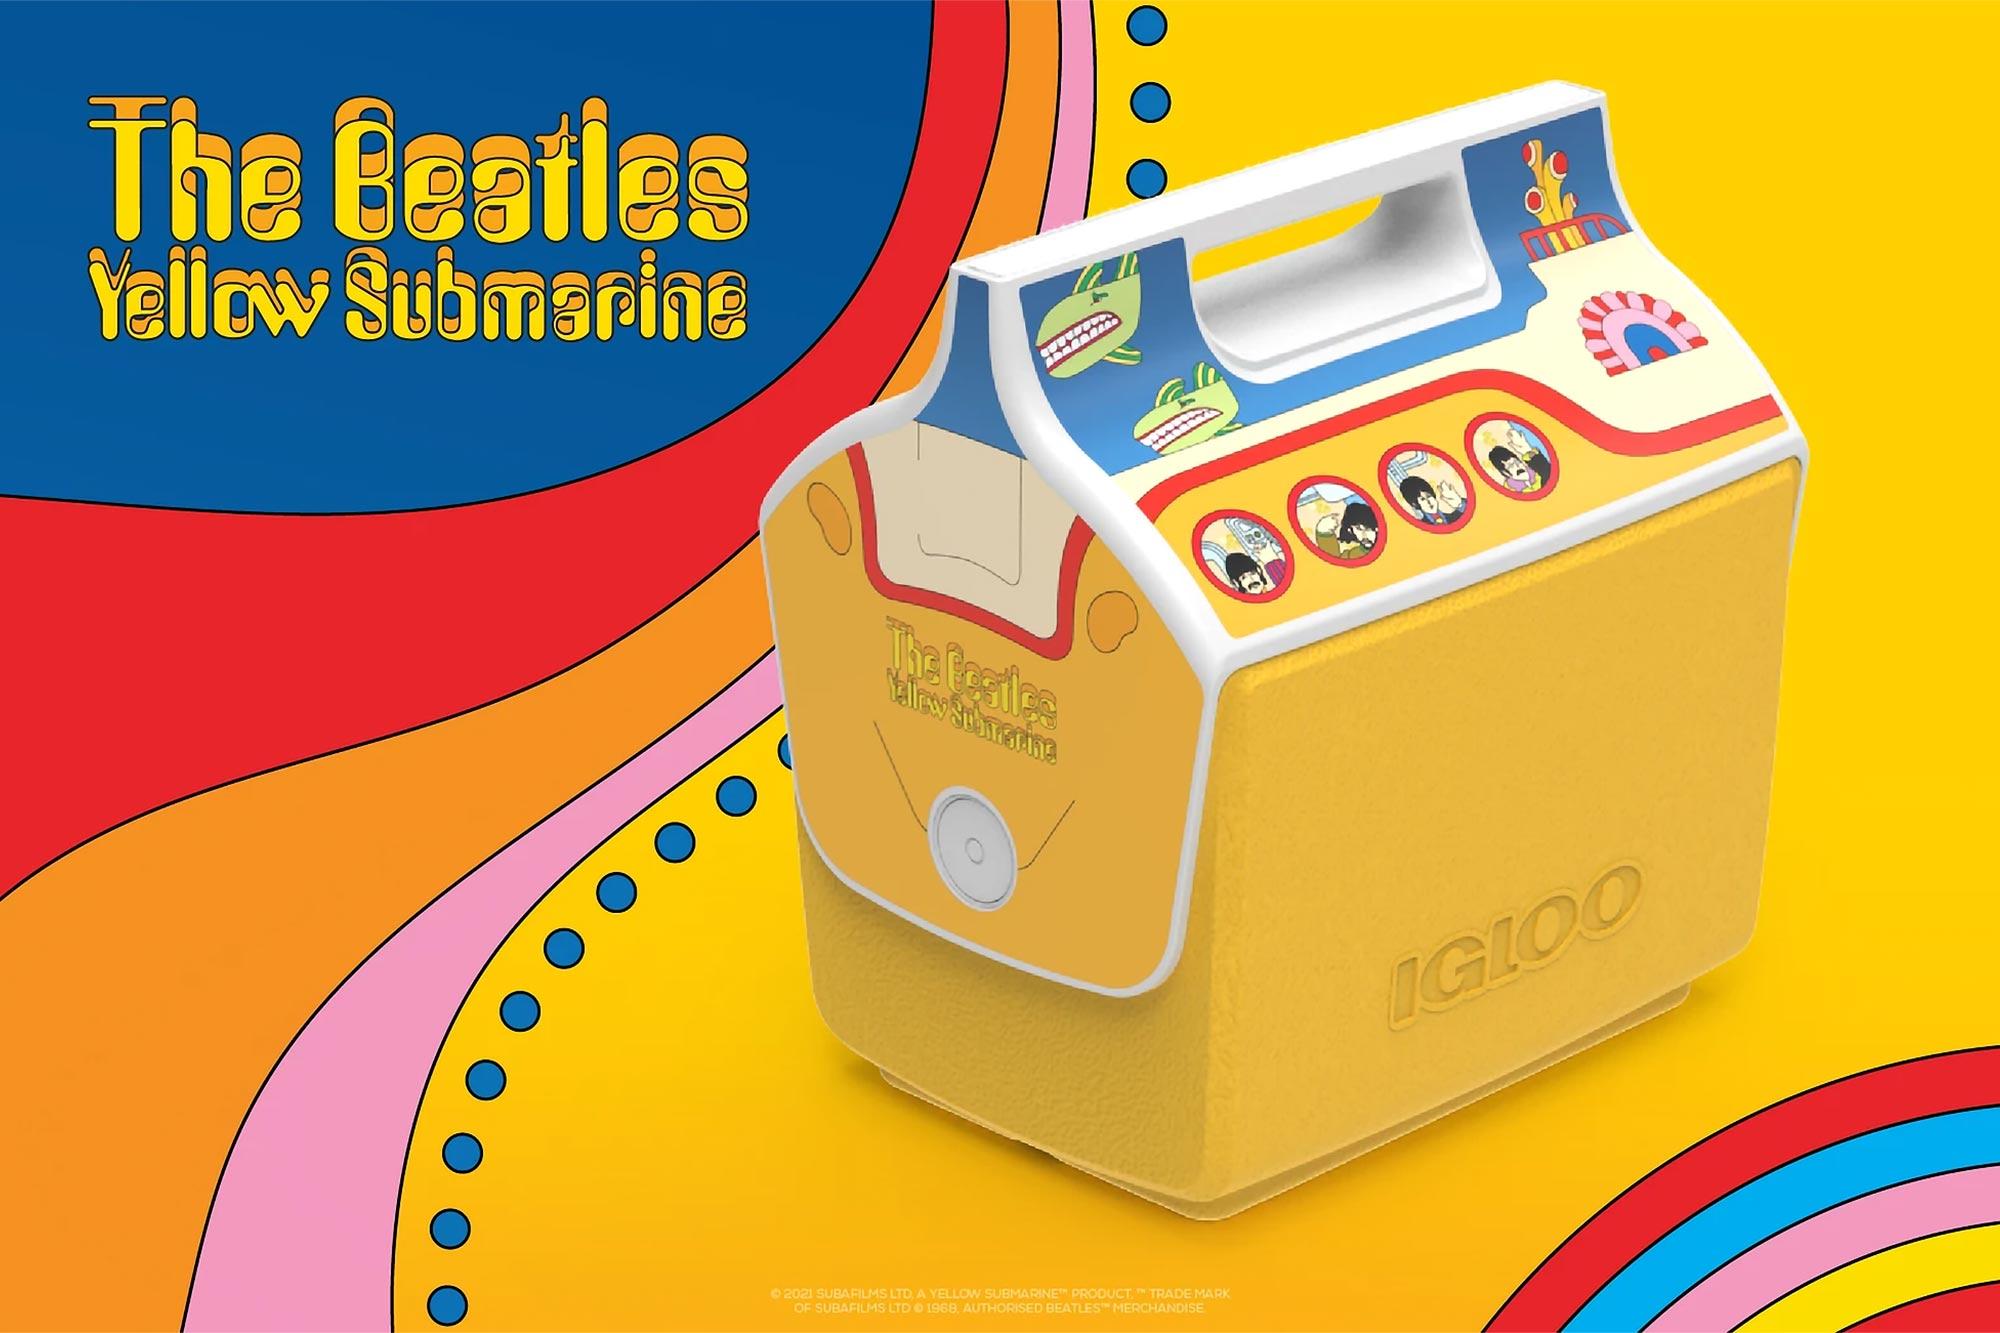 The Beatles Yellow Submarine Igloo Coolers